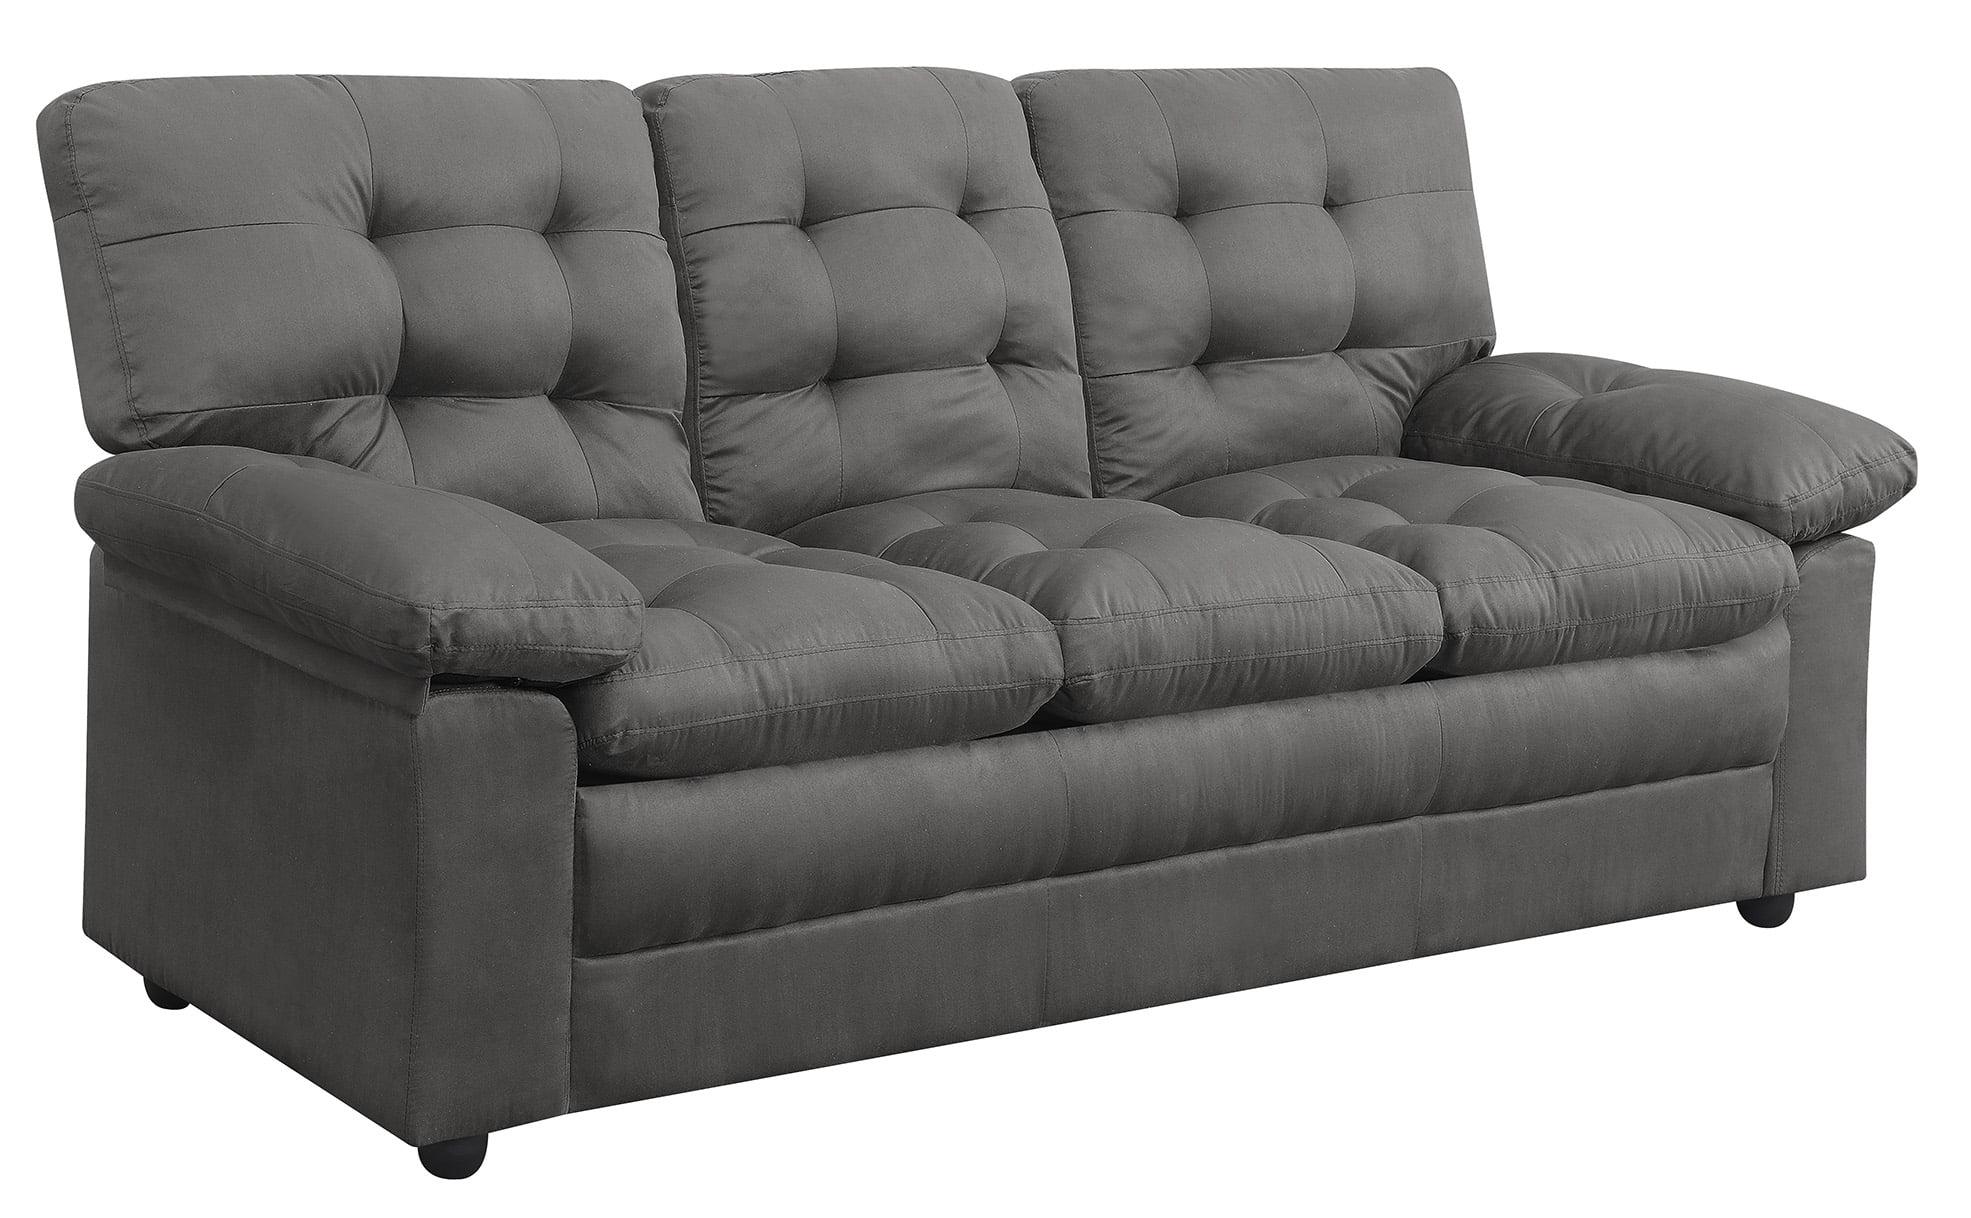 Mainstays Buchannan Sofa Grey Microfiber Walmart